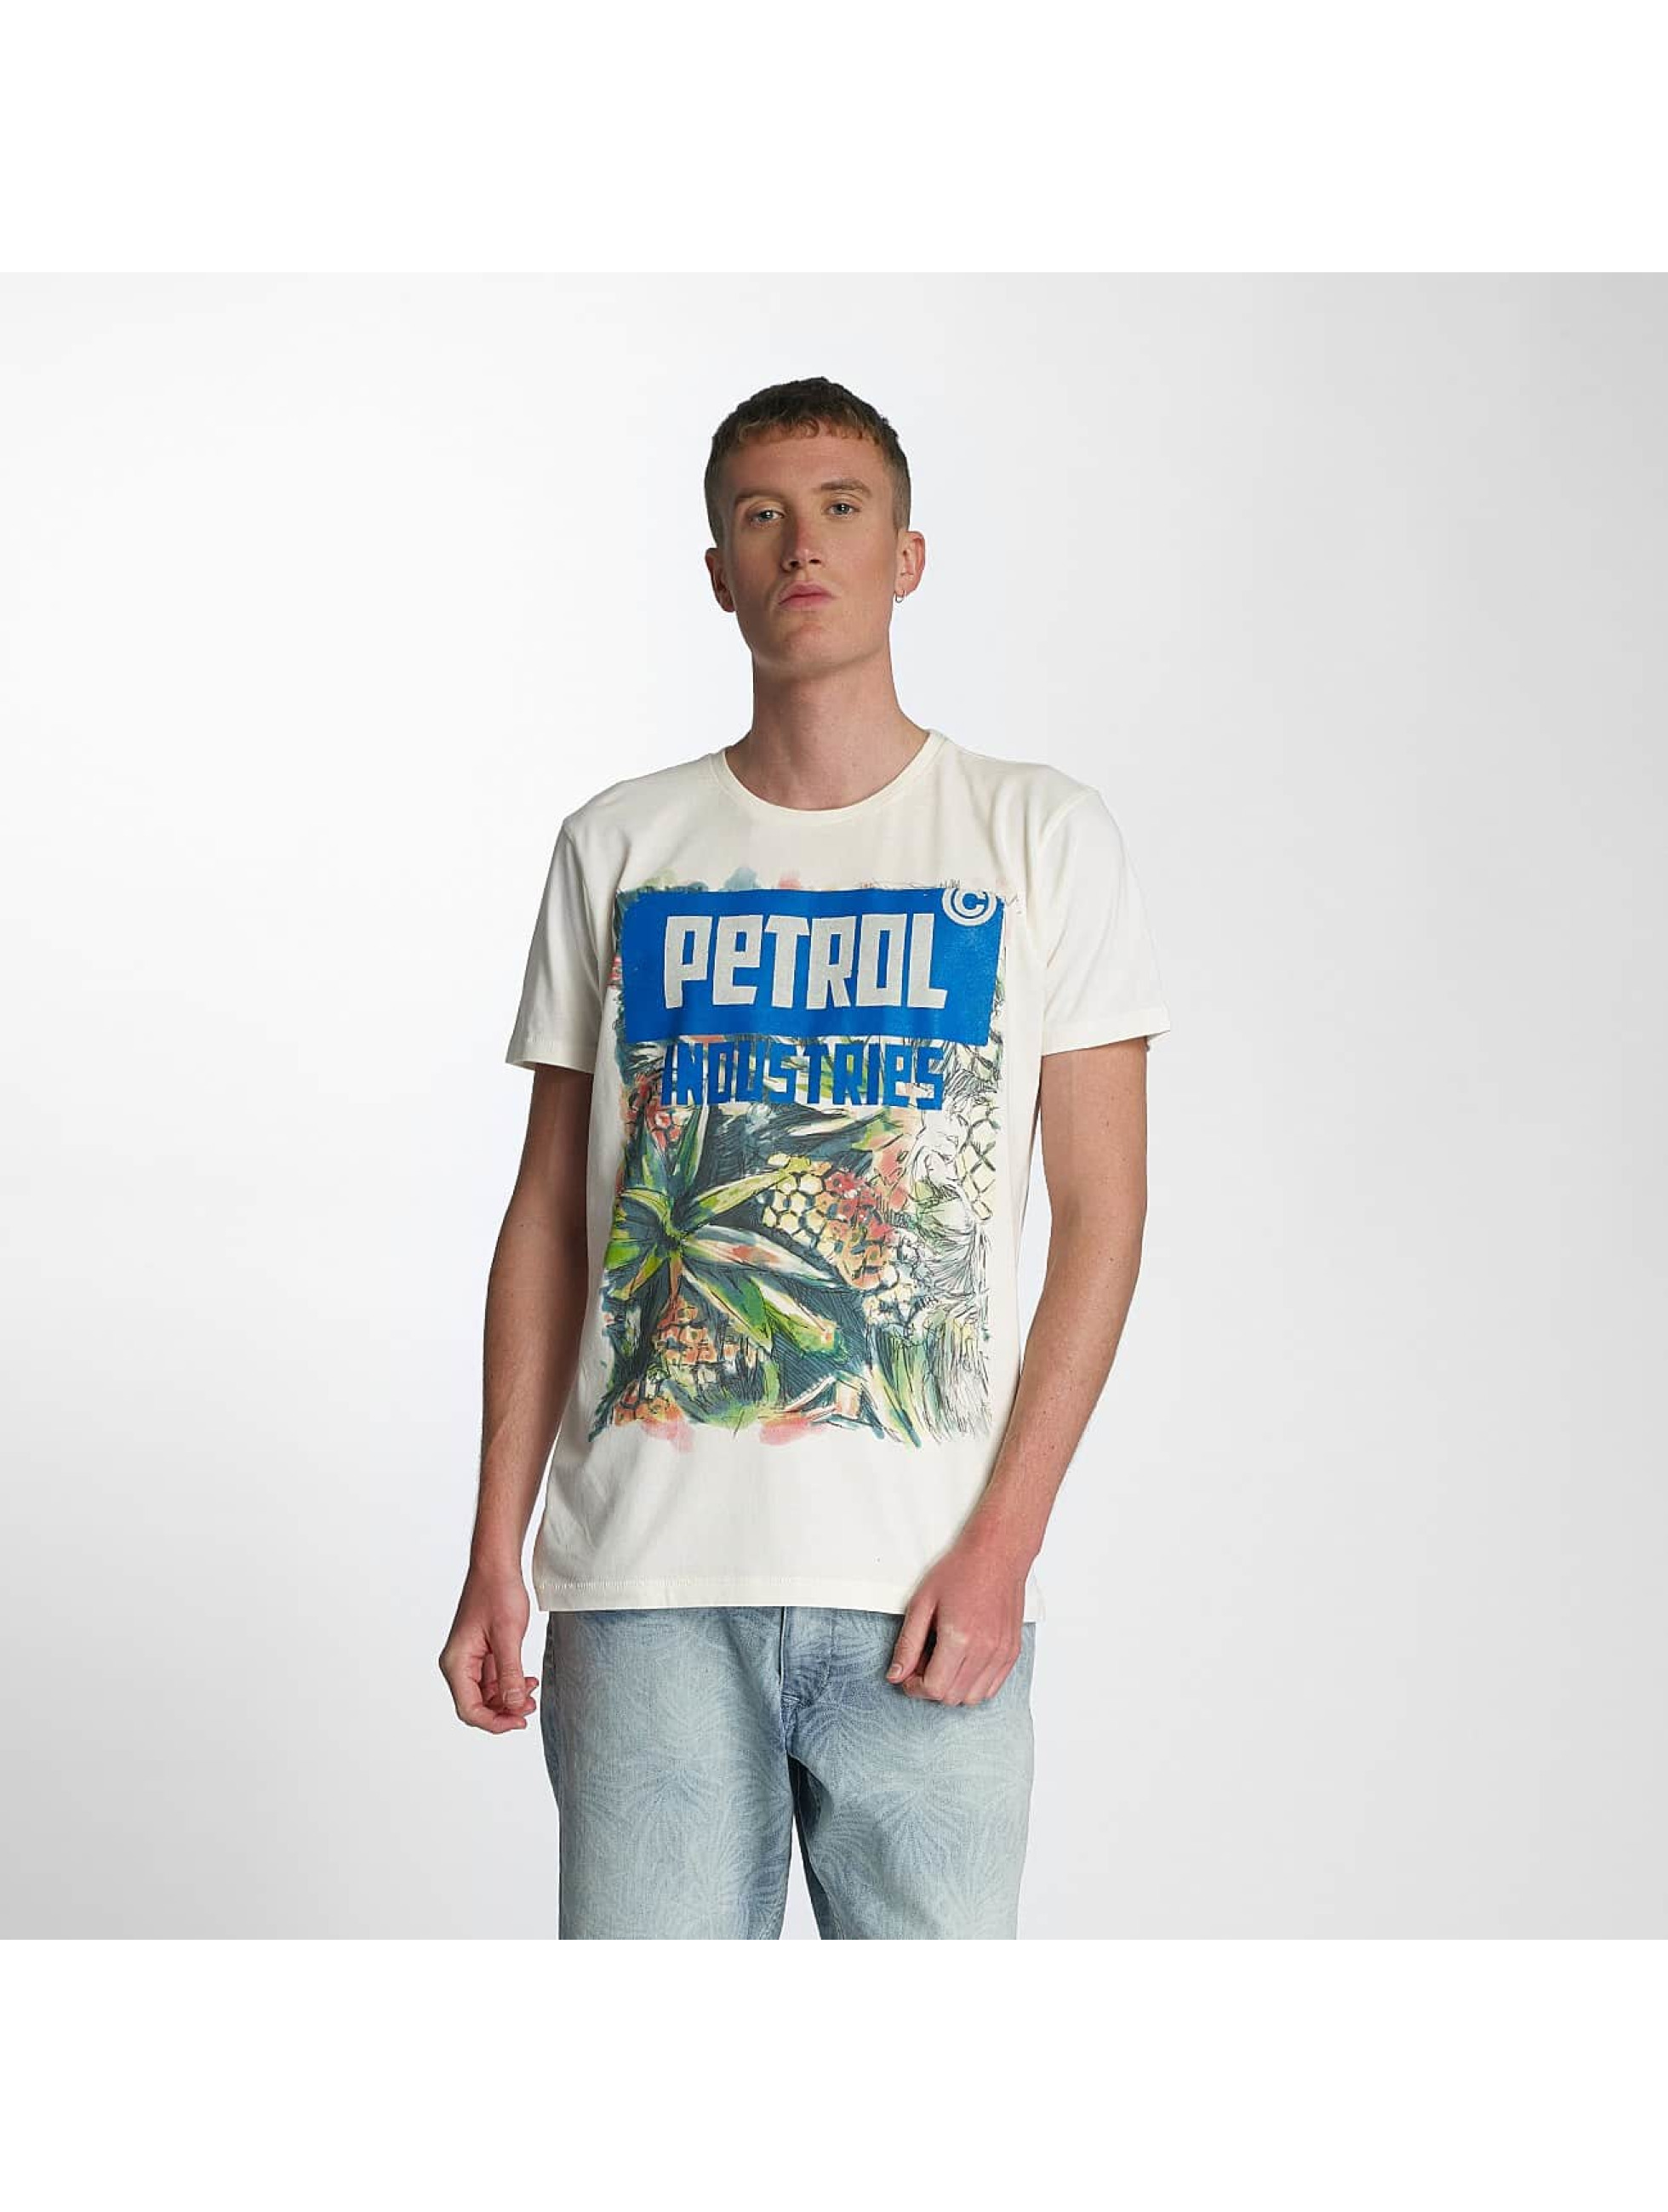 Petrol-Industries-Uomini-Maglieria-T-shirt-Summer